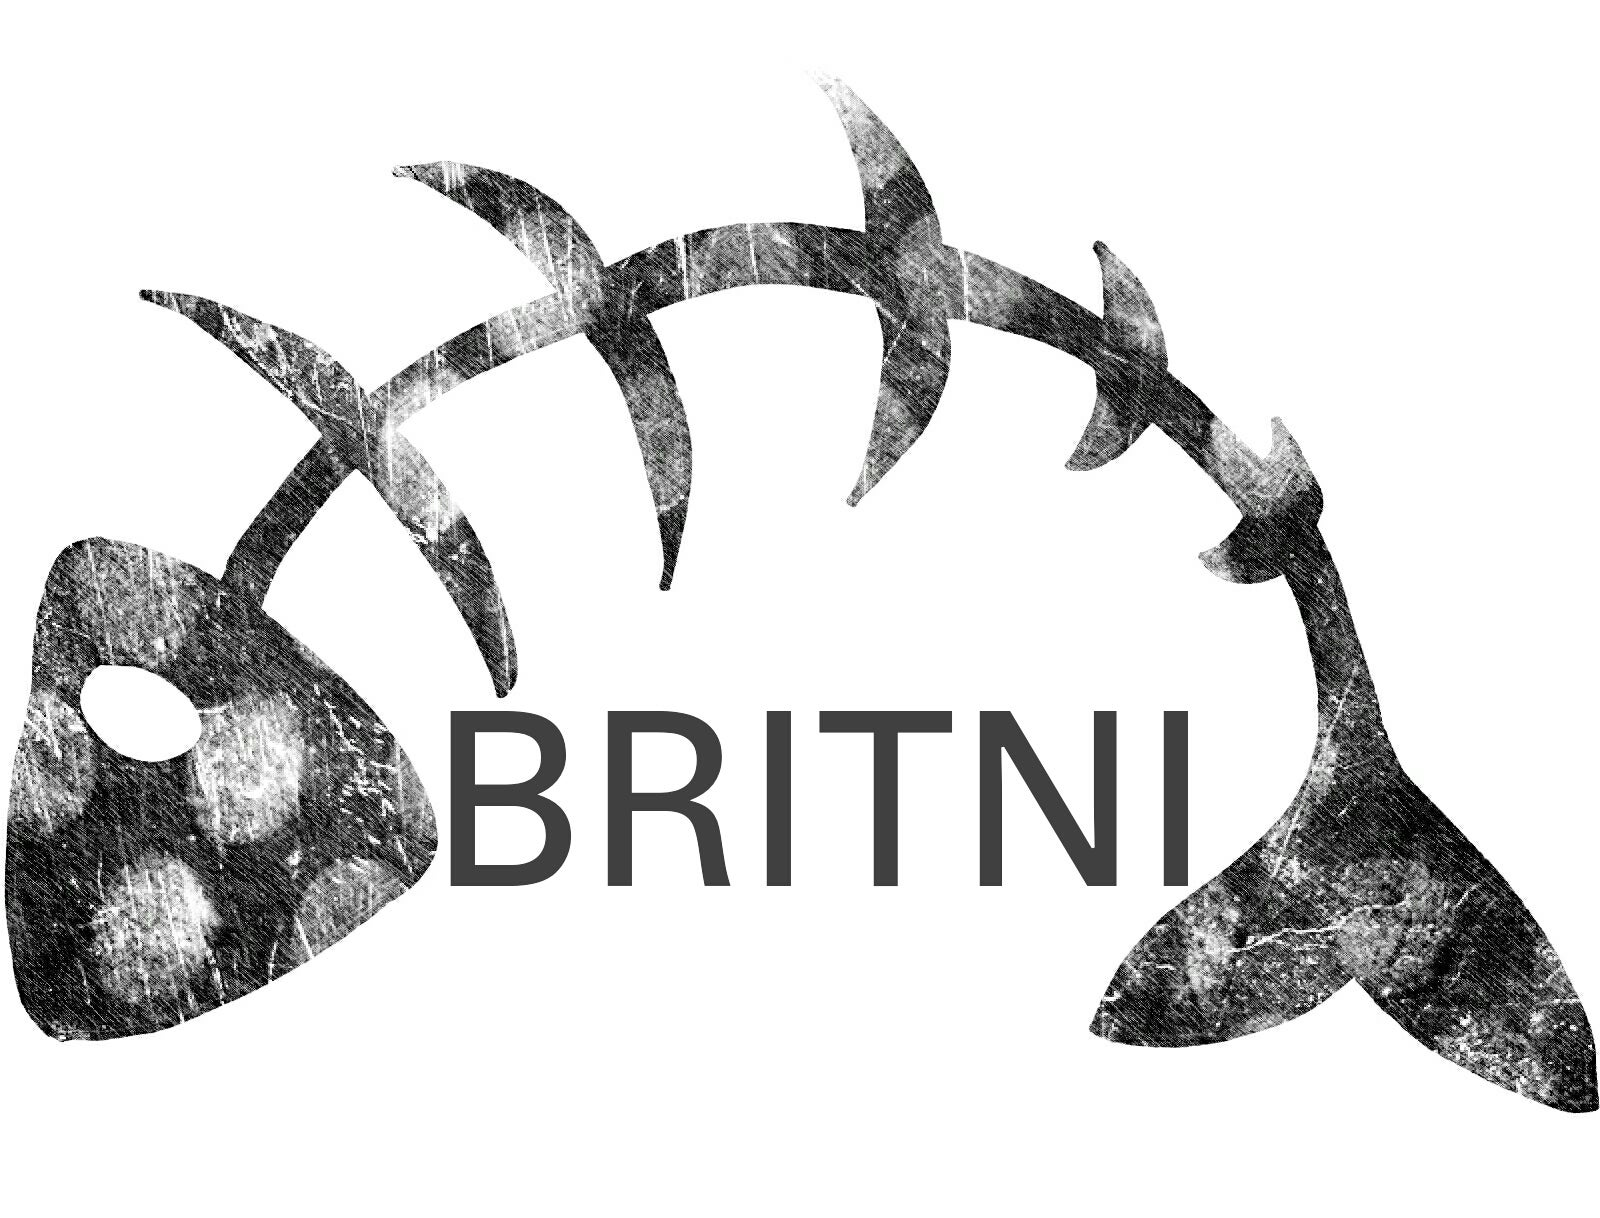 Britni